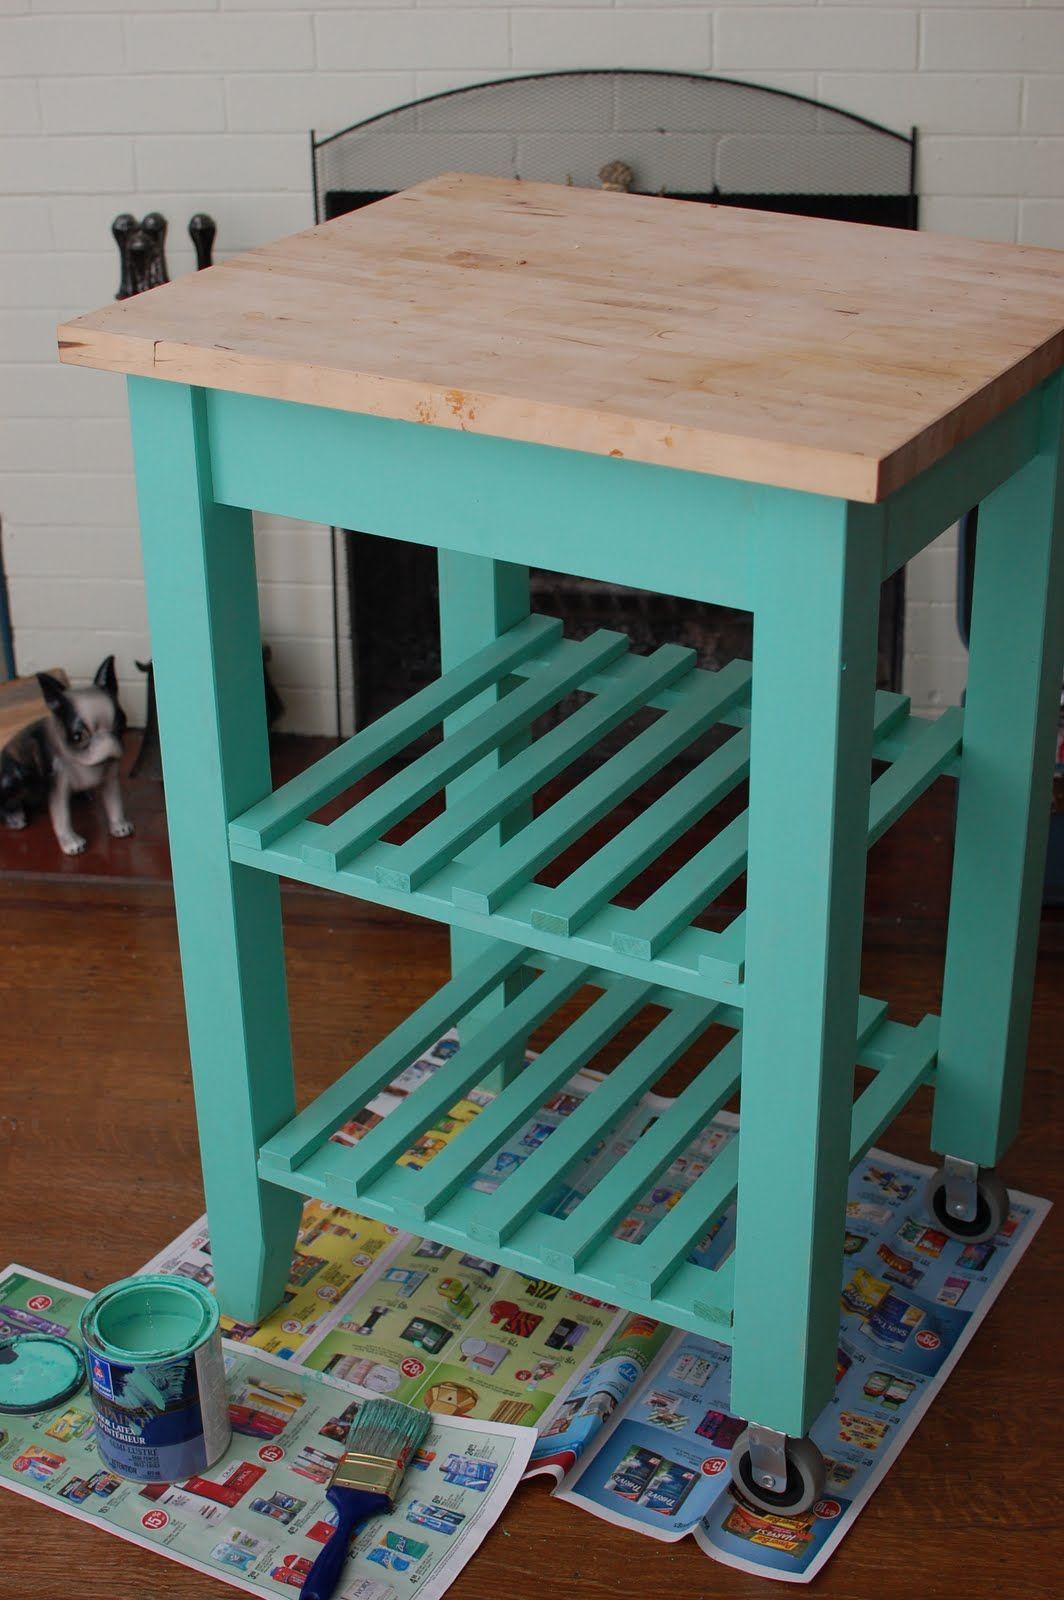 ikea kitchen cart painted aqua